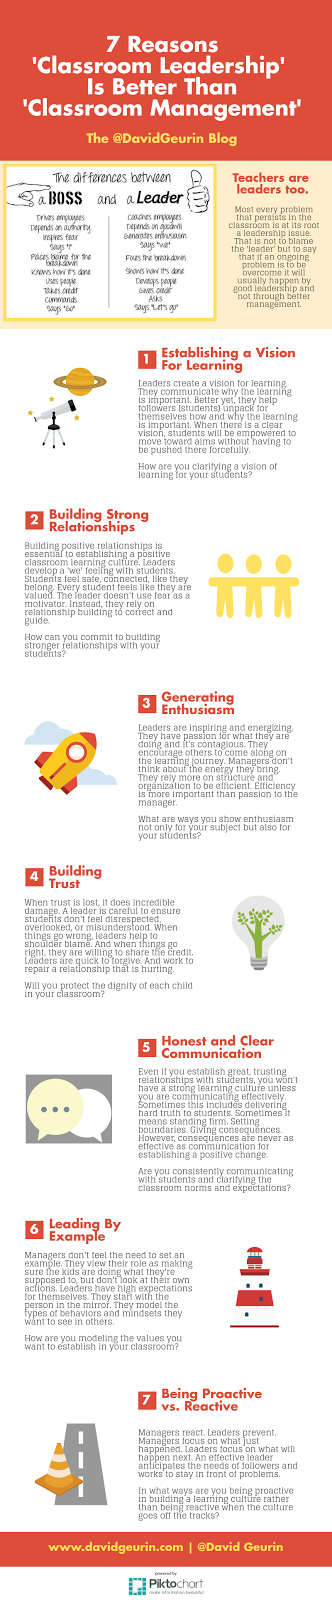 The @DavidGeurin Blog: 7 Reasons 'Classroom Leadership' Is Better